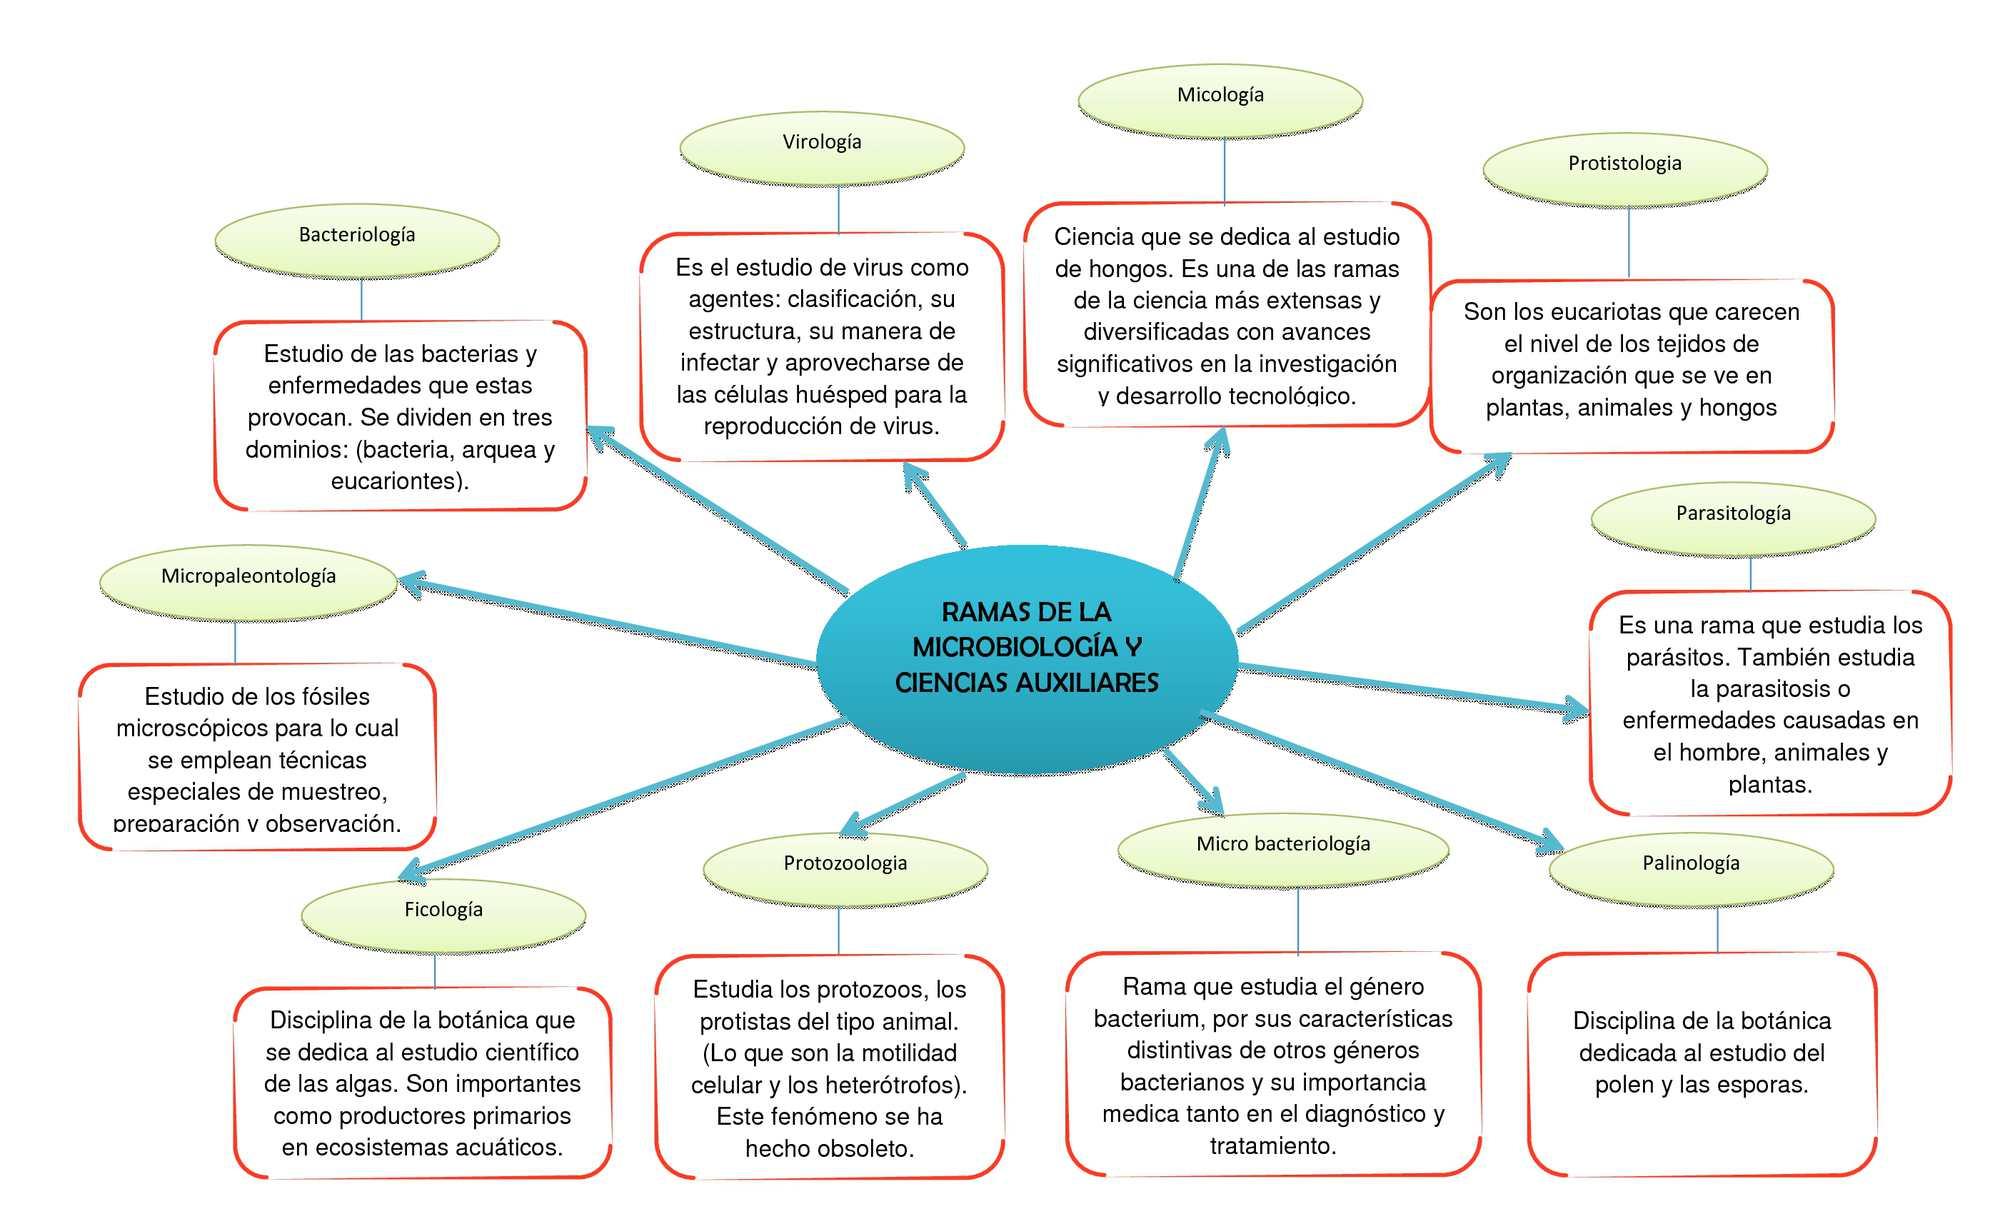 Calaméo Mapa Mental De La Microbiologia